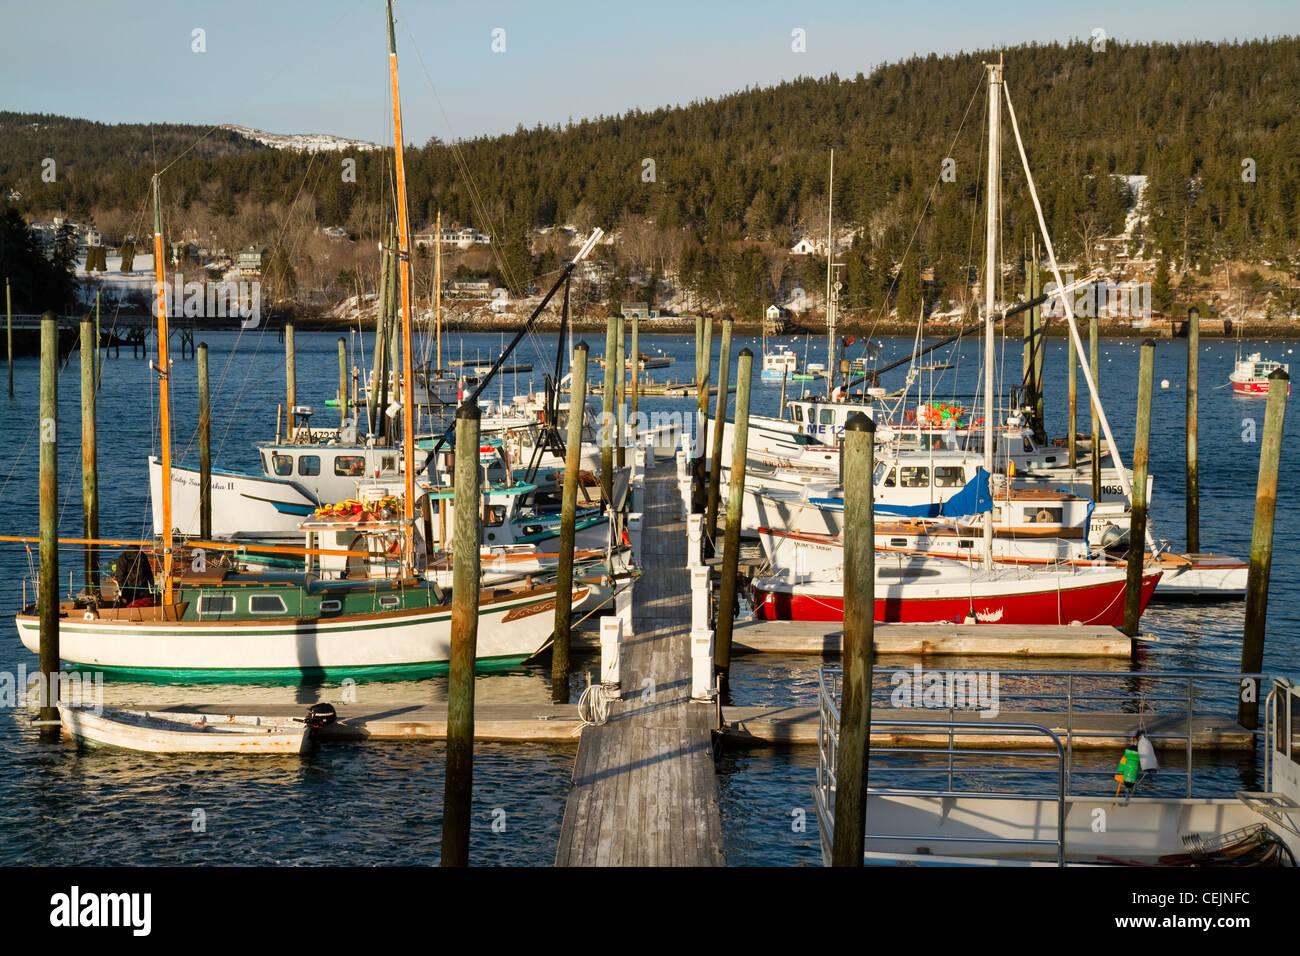 Coastal life in Maine. - Stock Image